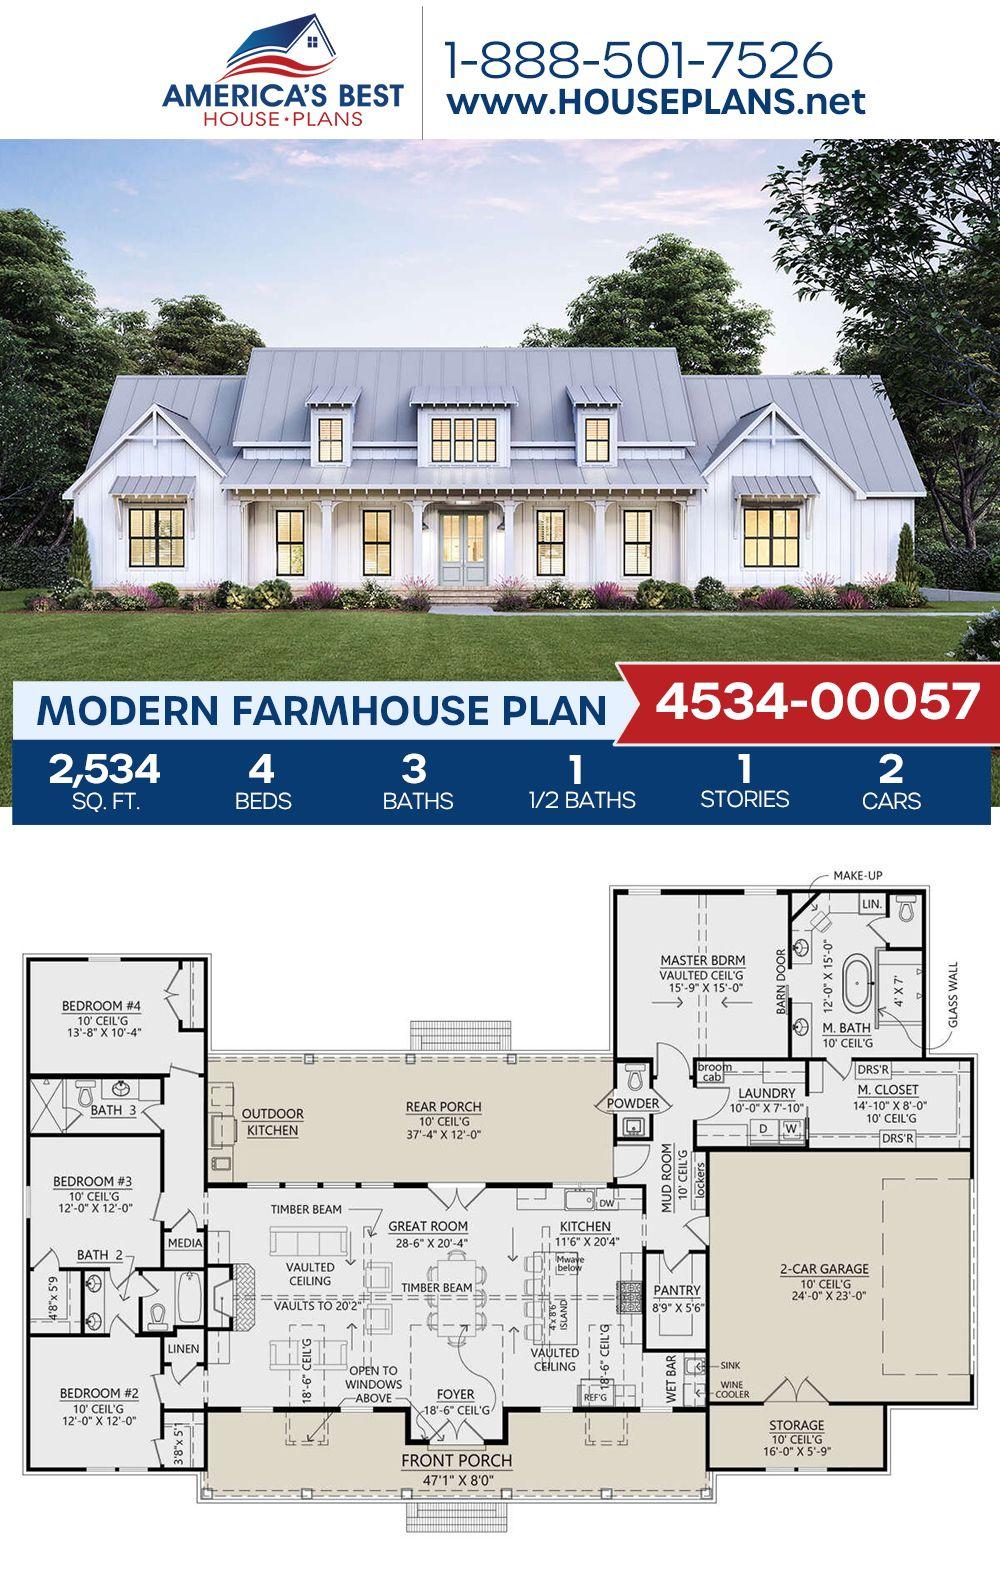 House Plan 4534 00057 Modern Farmhouse Plan 2 534 Square Feet 4 Bedrooms 3 5 Bathrooms In 2021 Modern Farmhouse Plans Open Floor Plan Farmhouse House Plans Farmhouse